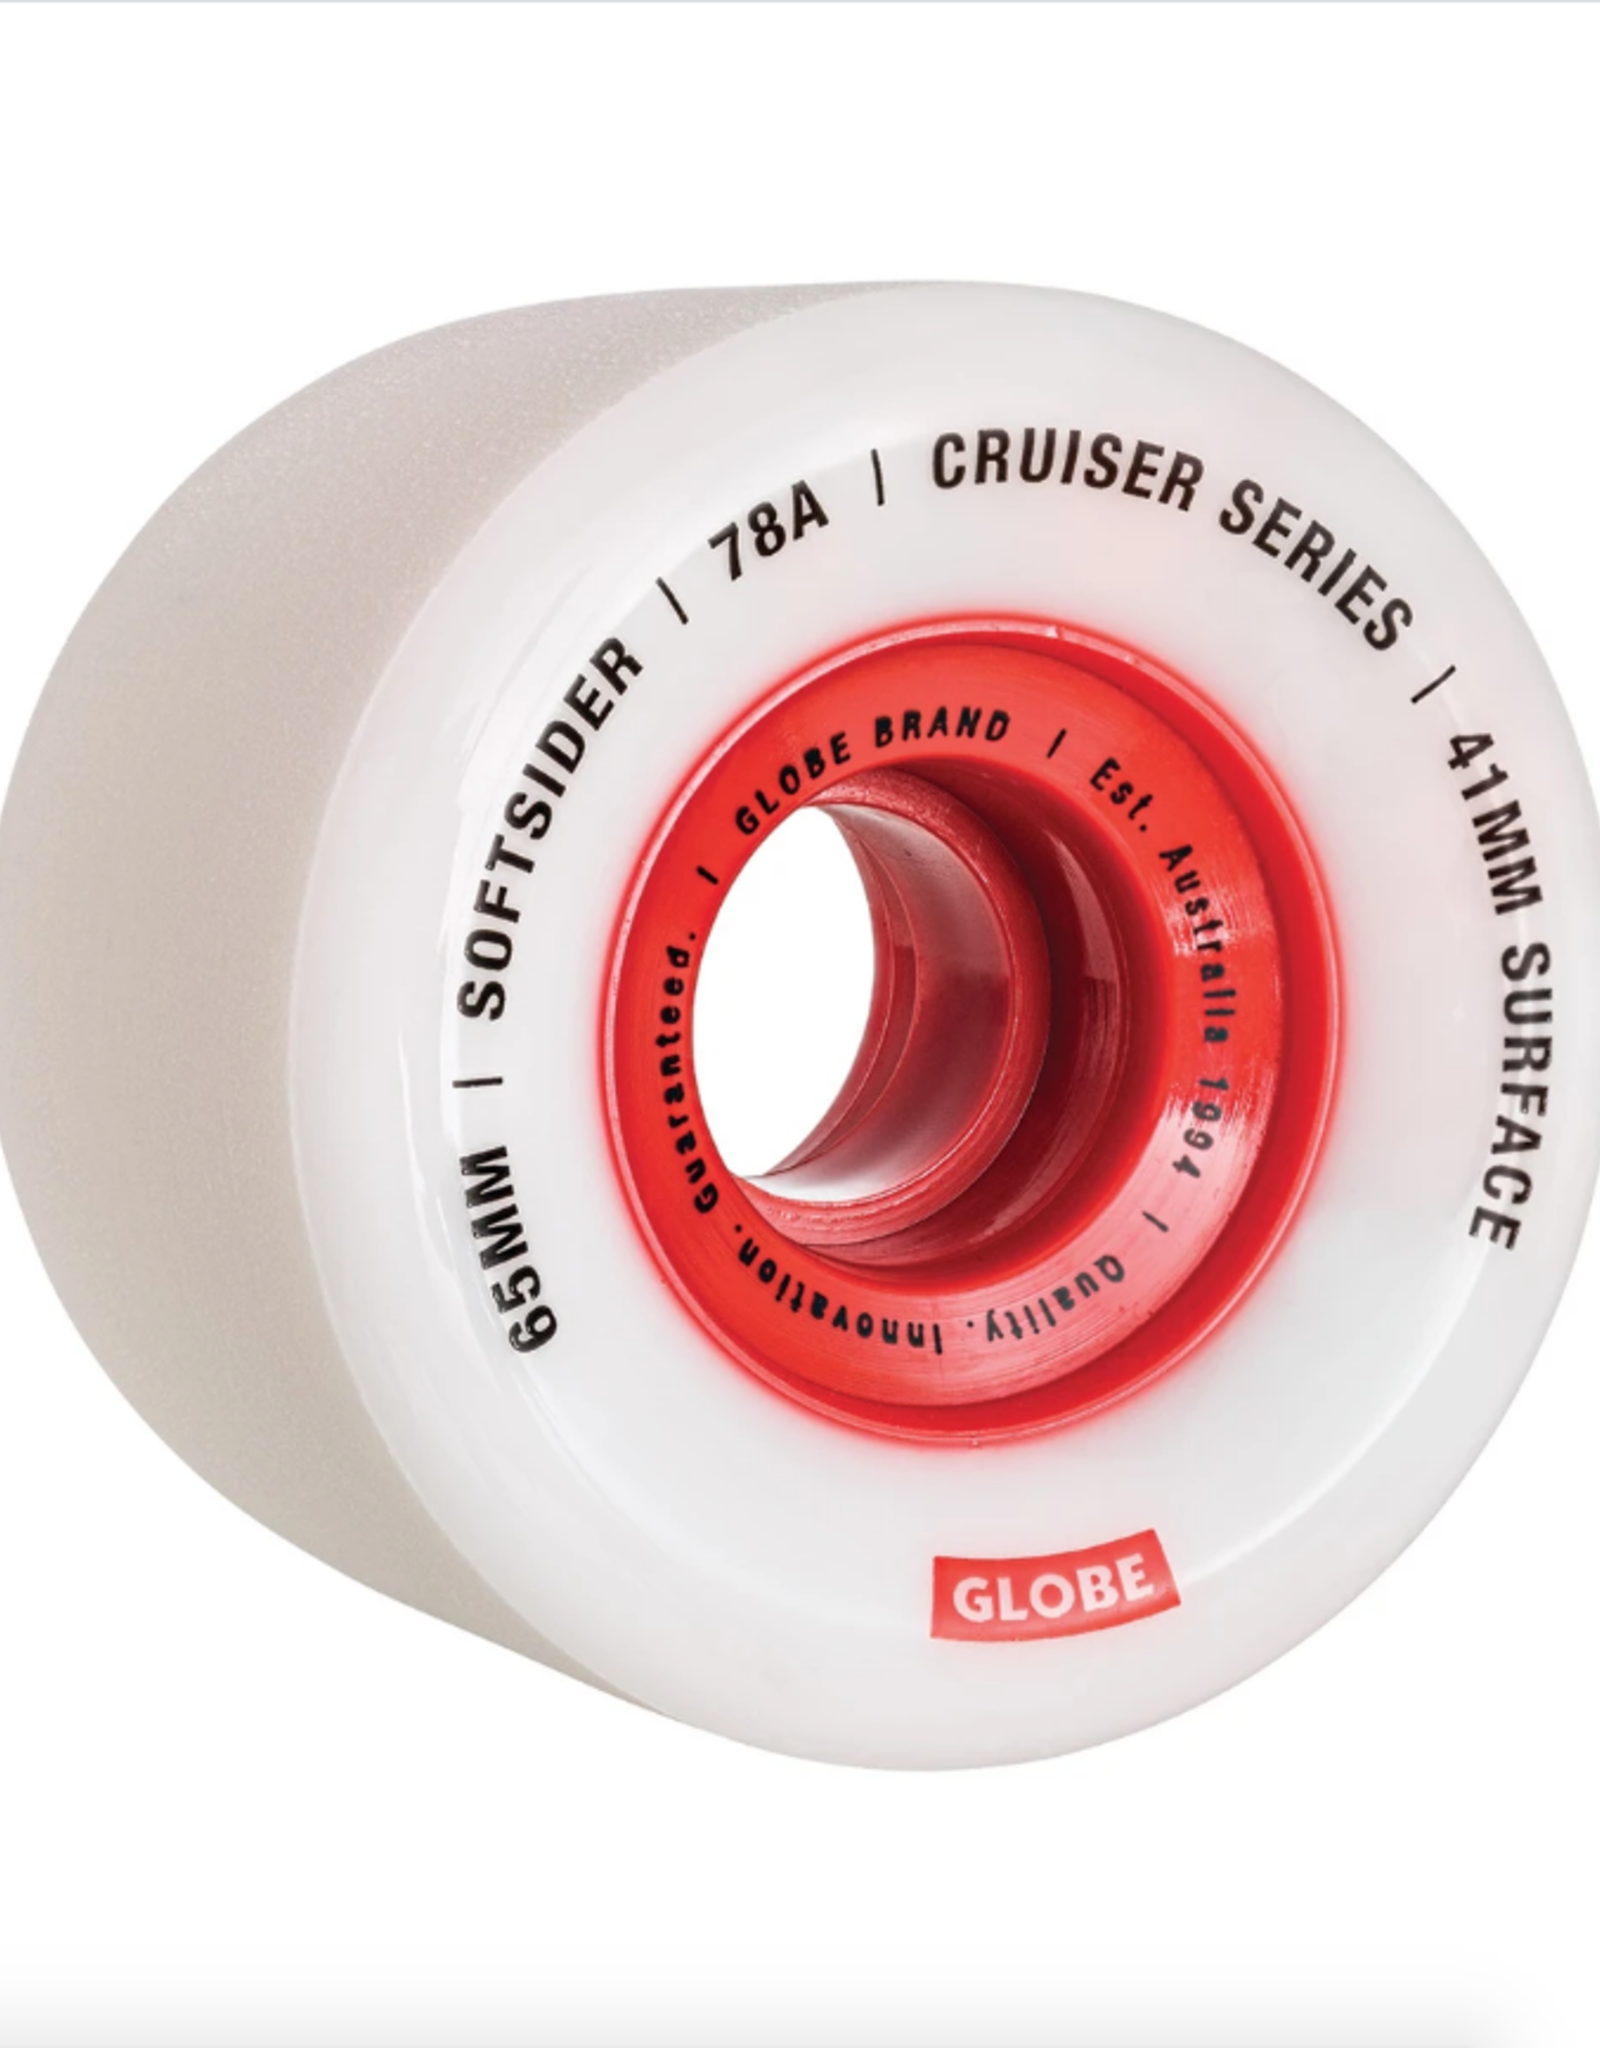 GLOBE Softsider Cruiser Wheel 65MM White/Red